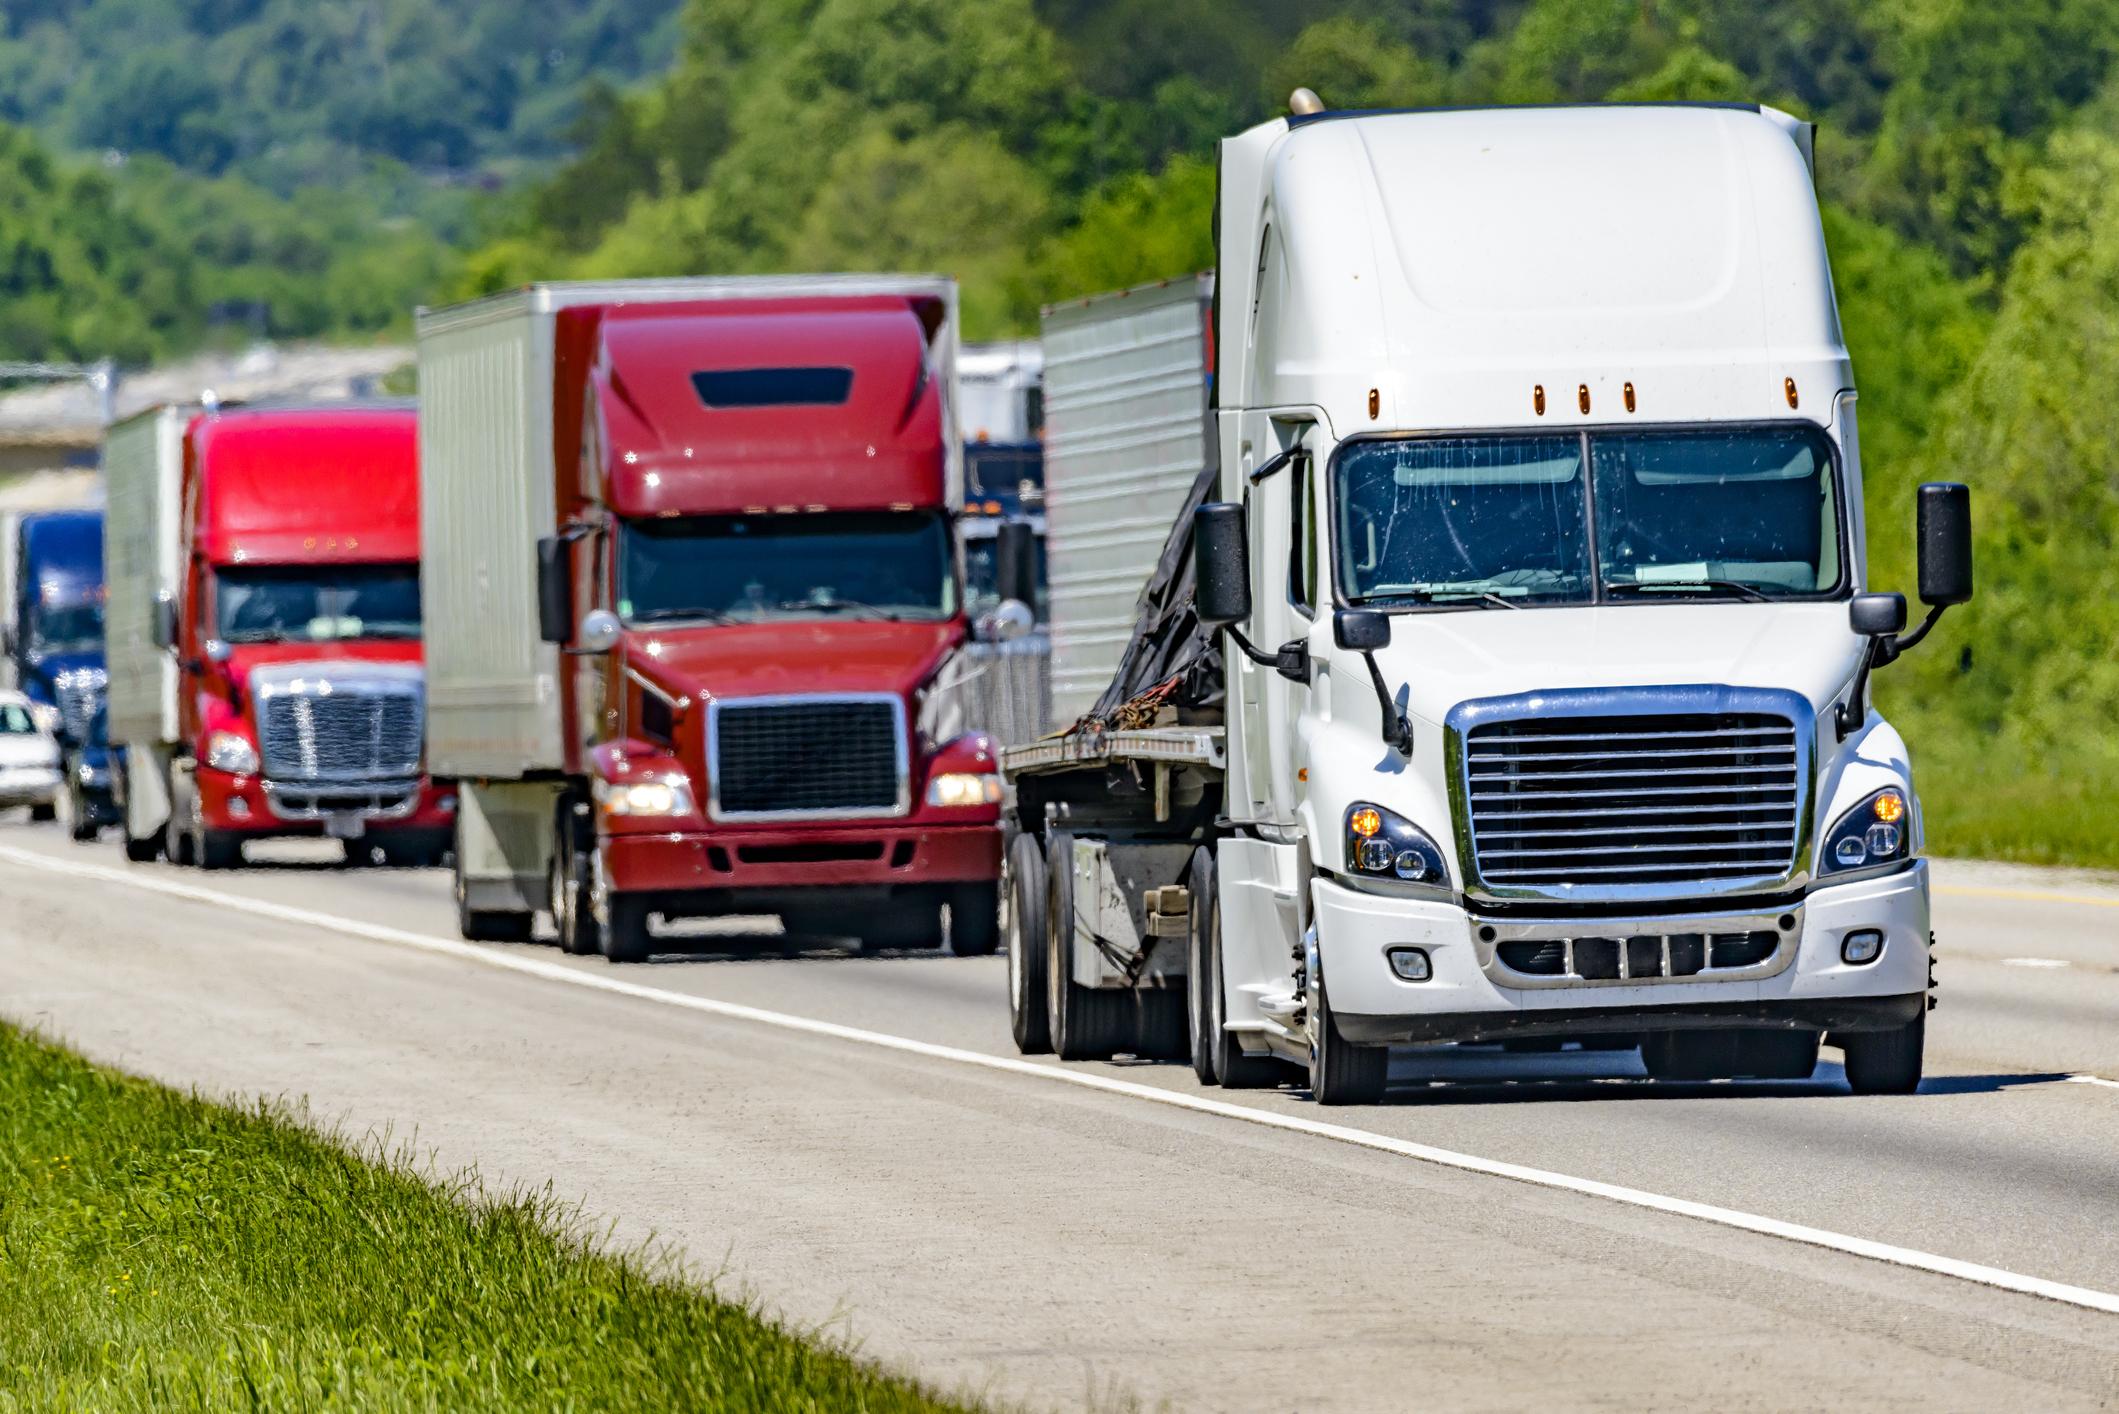 Multiple semi-trucks hauling loads on a highway.